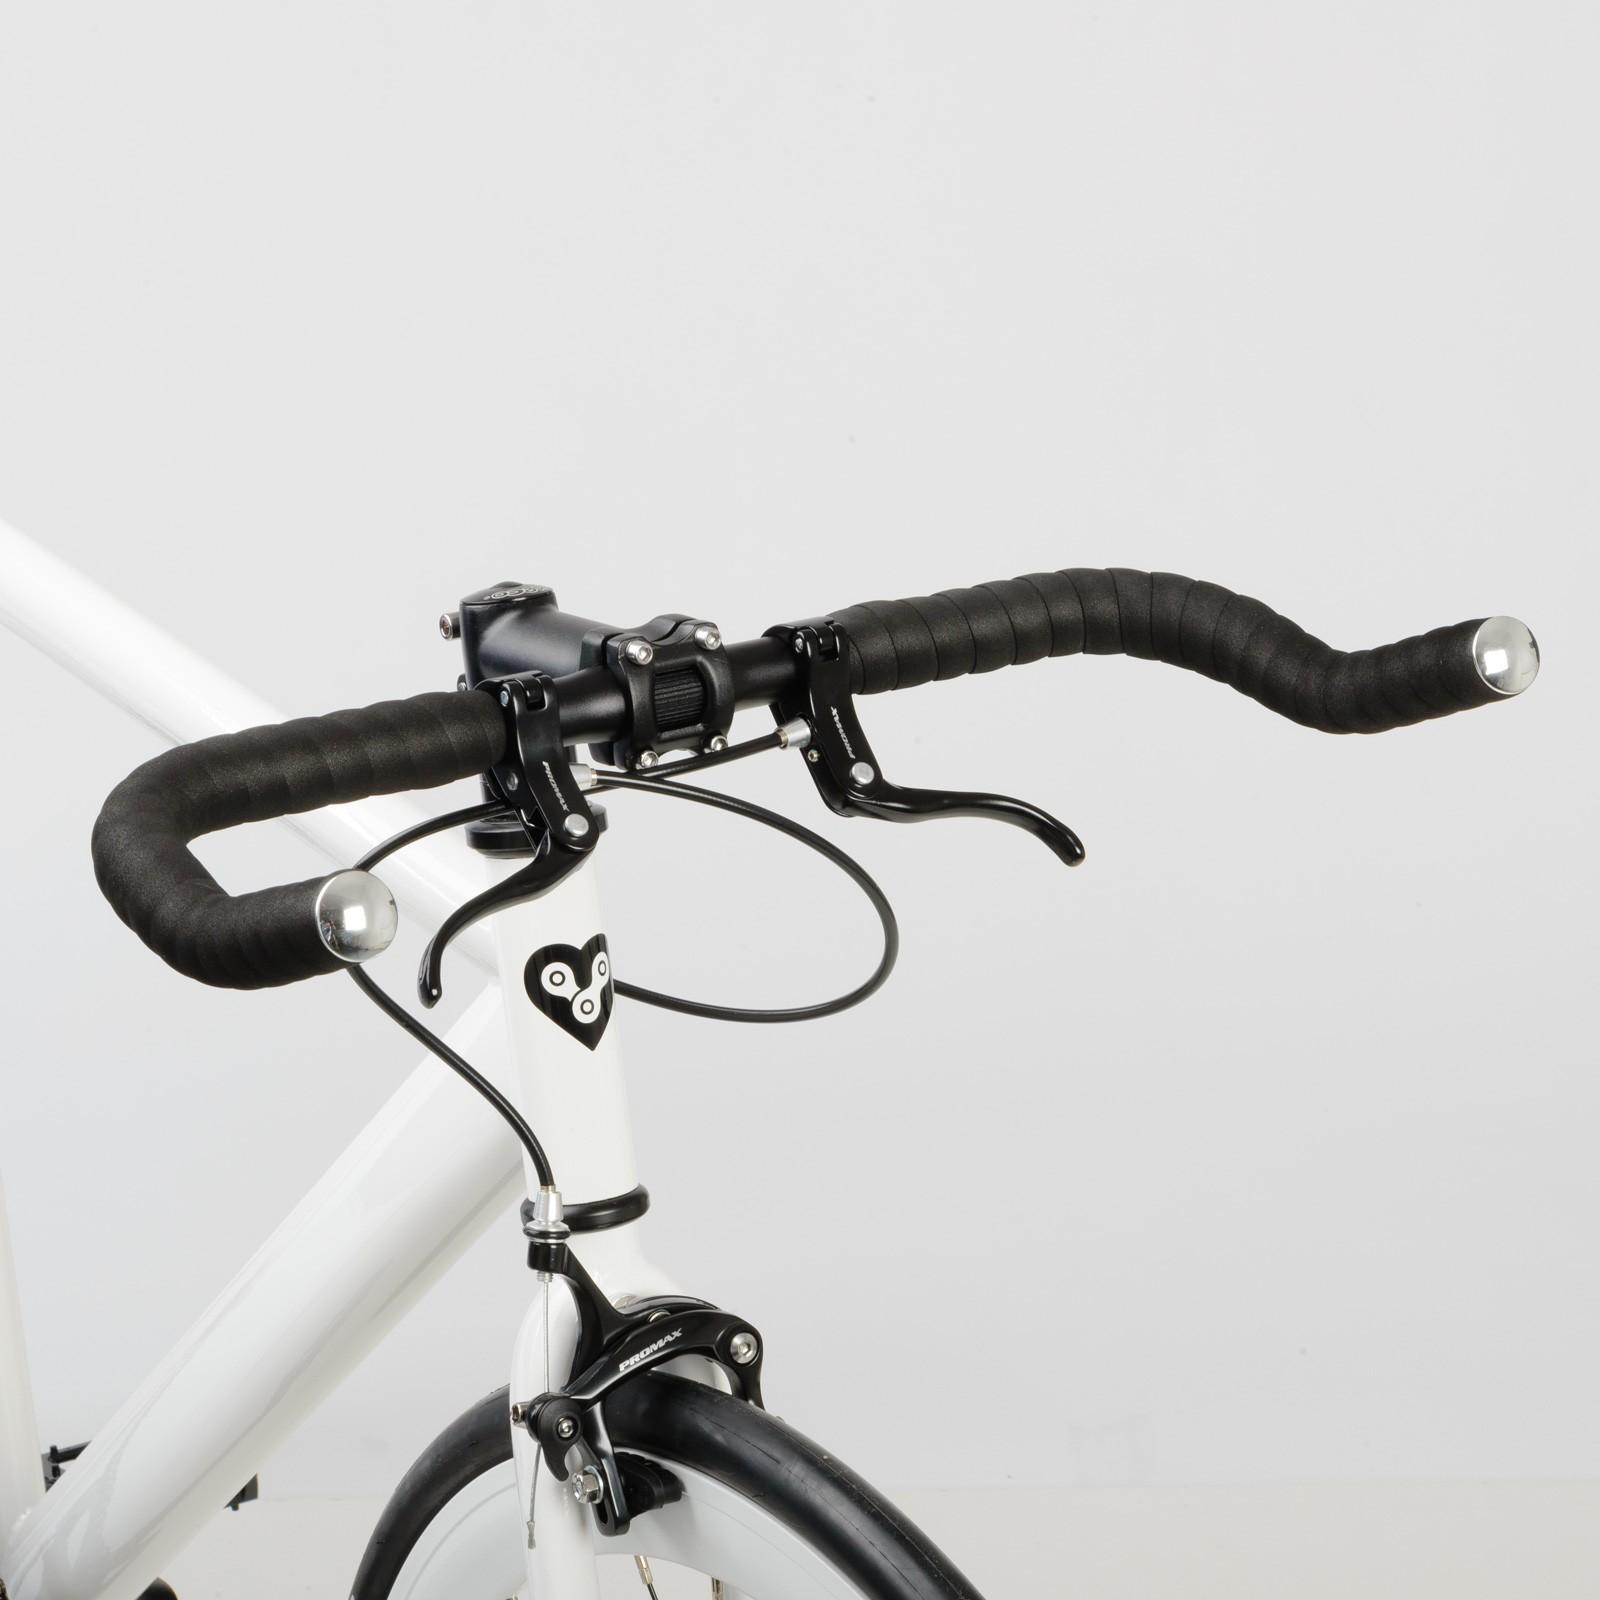 bullhorn fahrradlenker f r dein singlespeed oder fixie. Black Bedroom Furniture Sets. Home Design Ideas